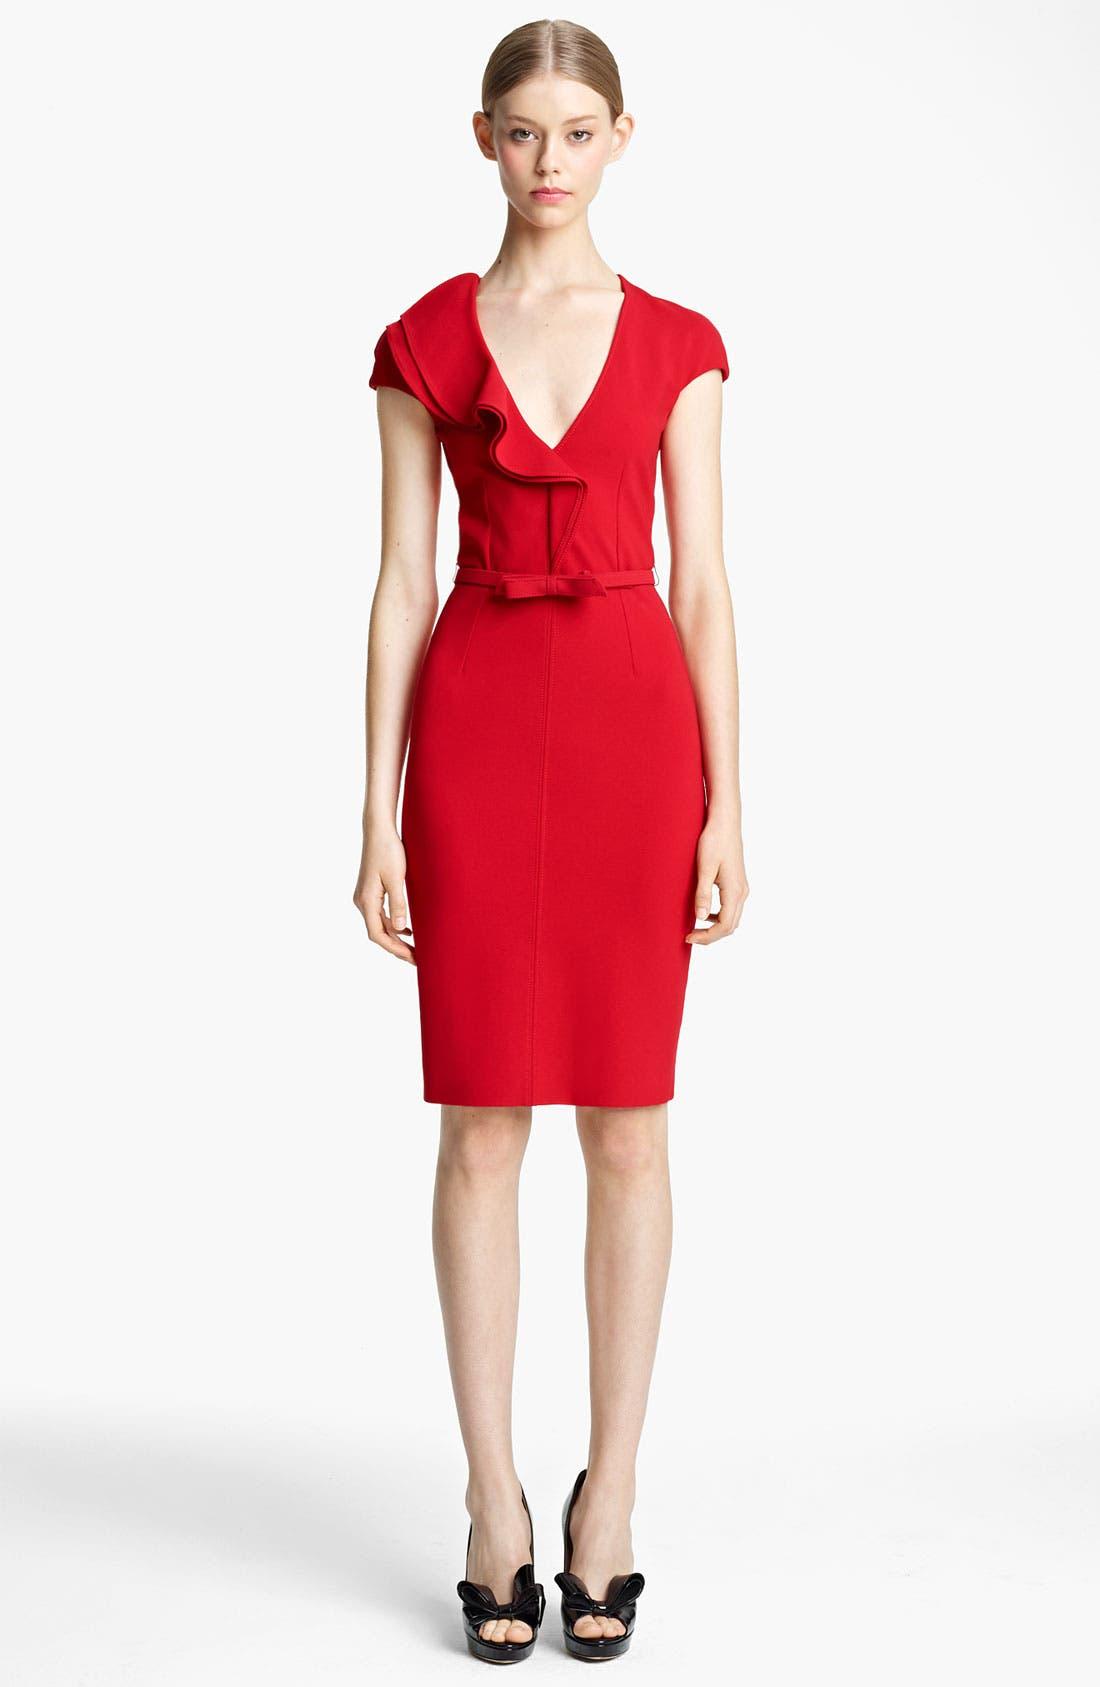 Main Image - Valentino Compact Jersey Sheath Dress with Bow Belt